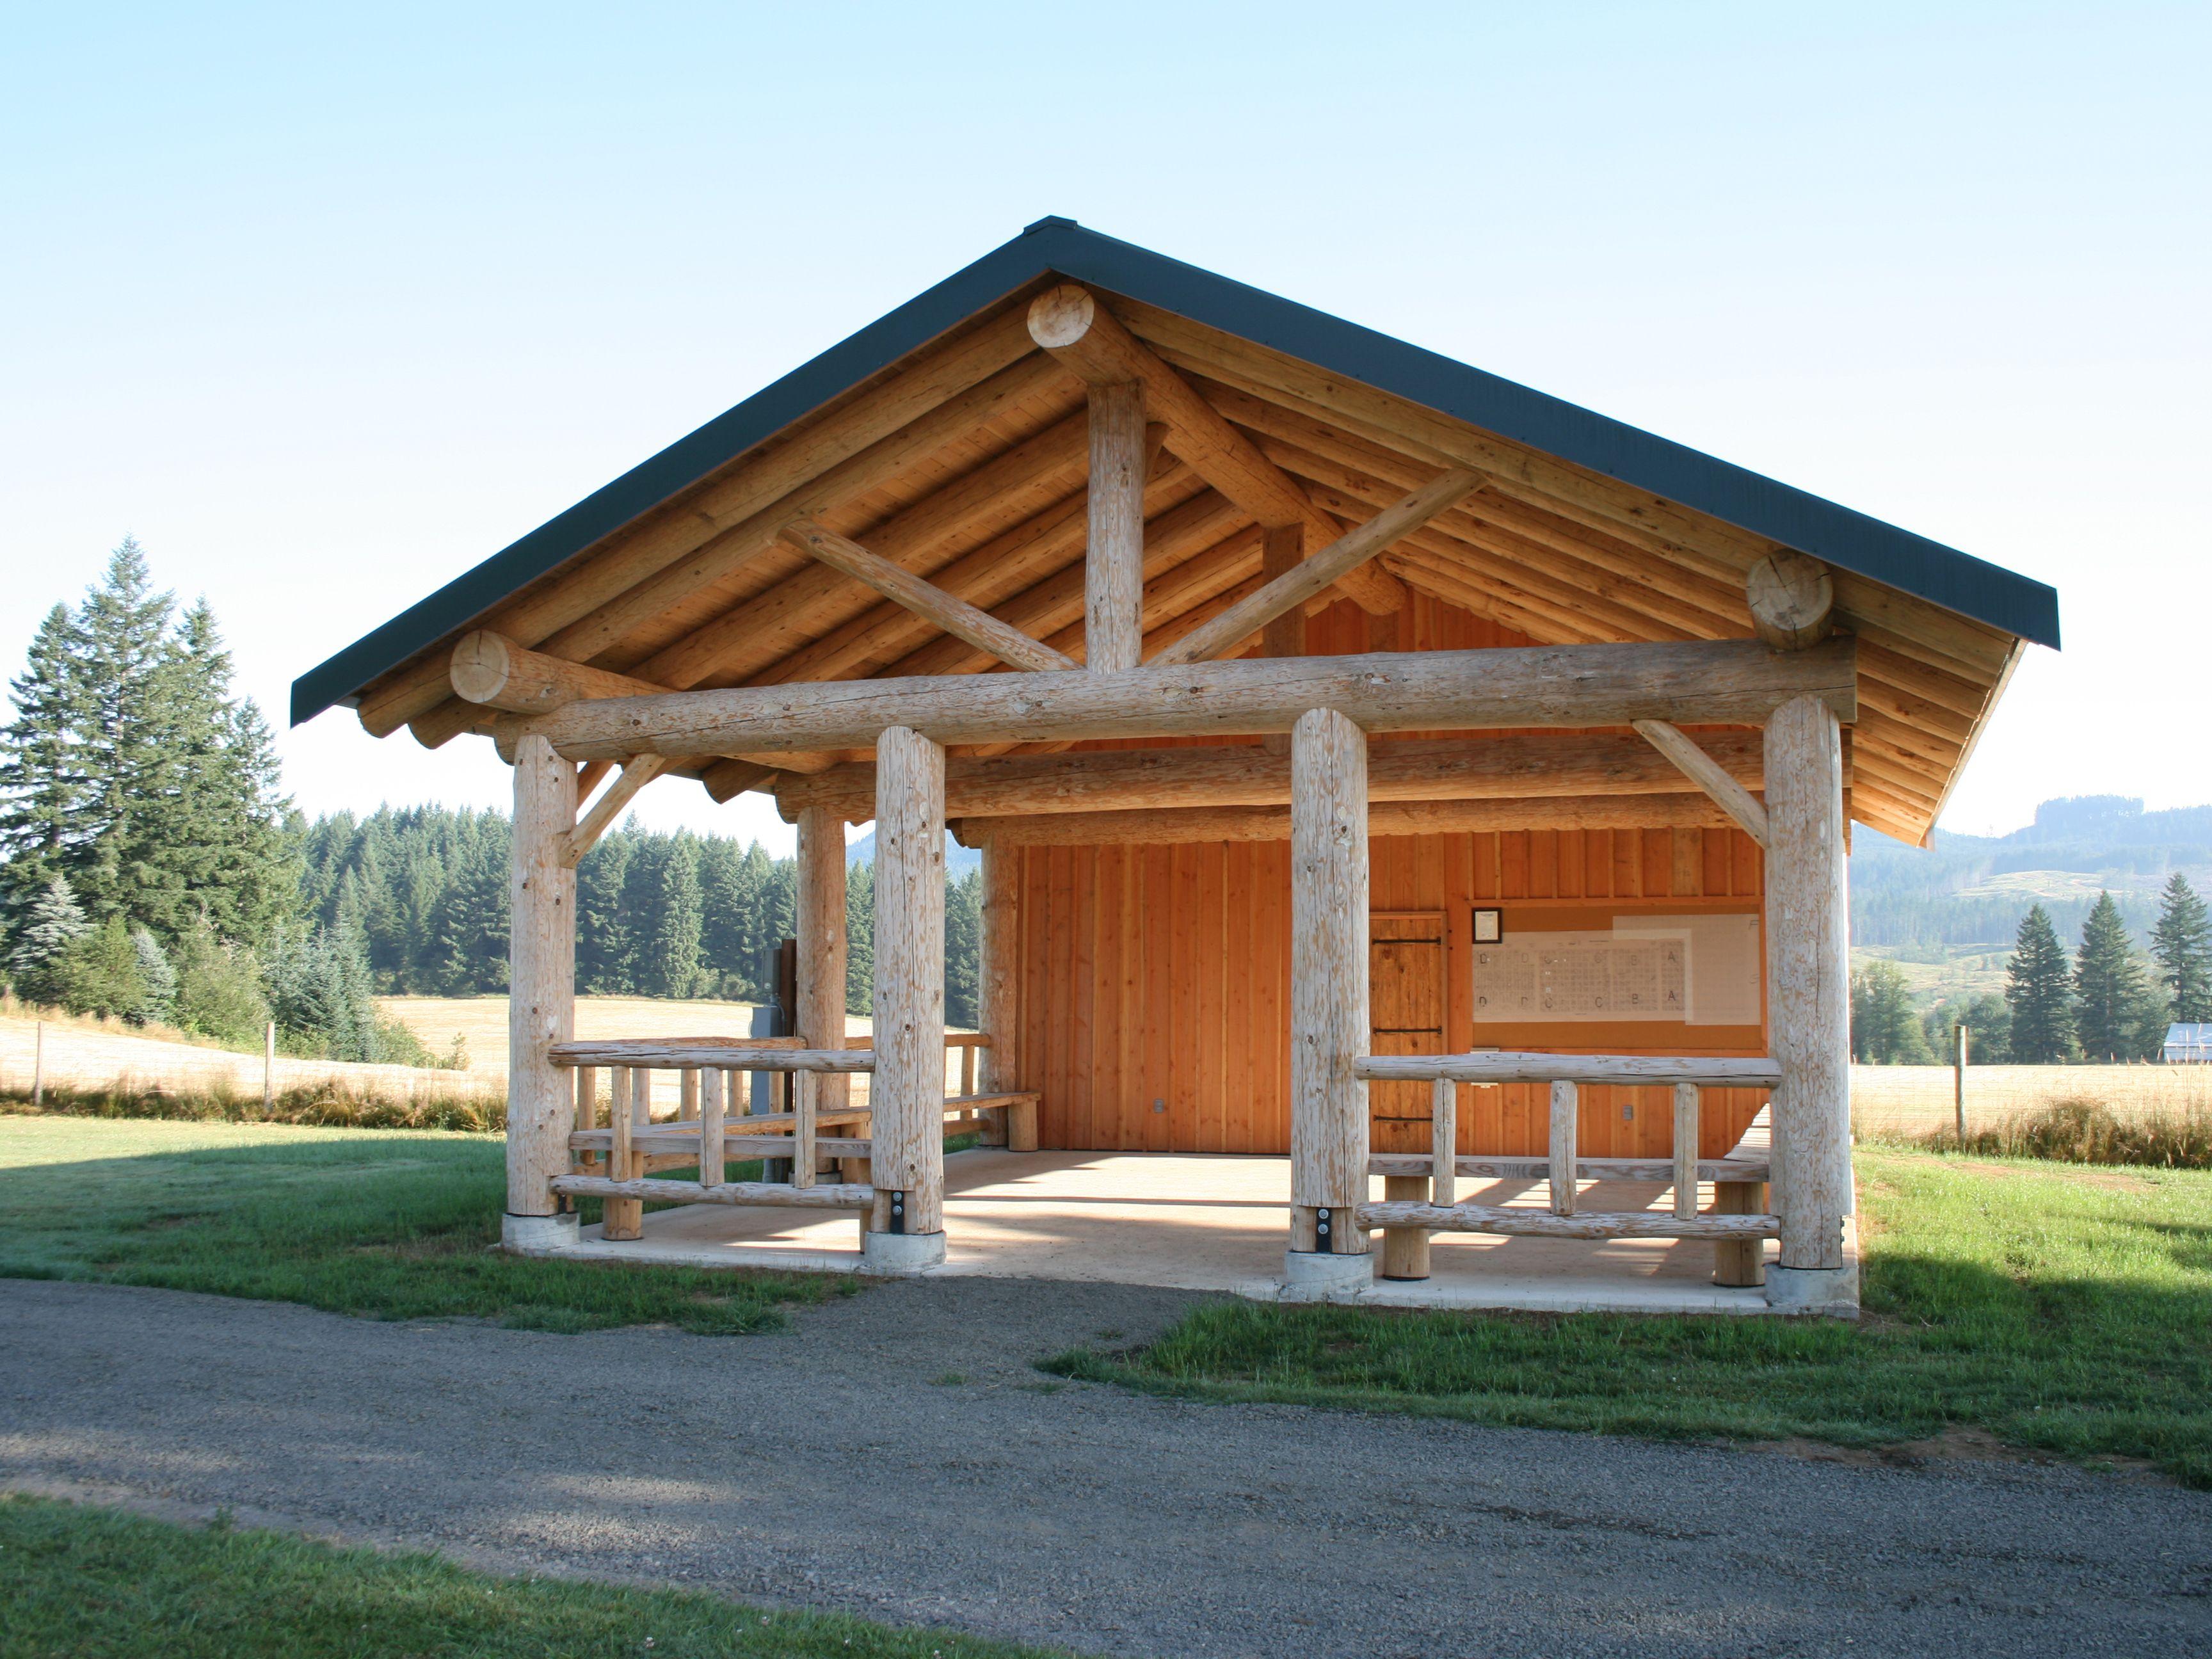 Log Pavilion at Fairview Cemetery in Oregon | Wood Gazebos ...